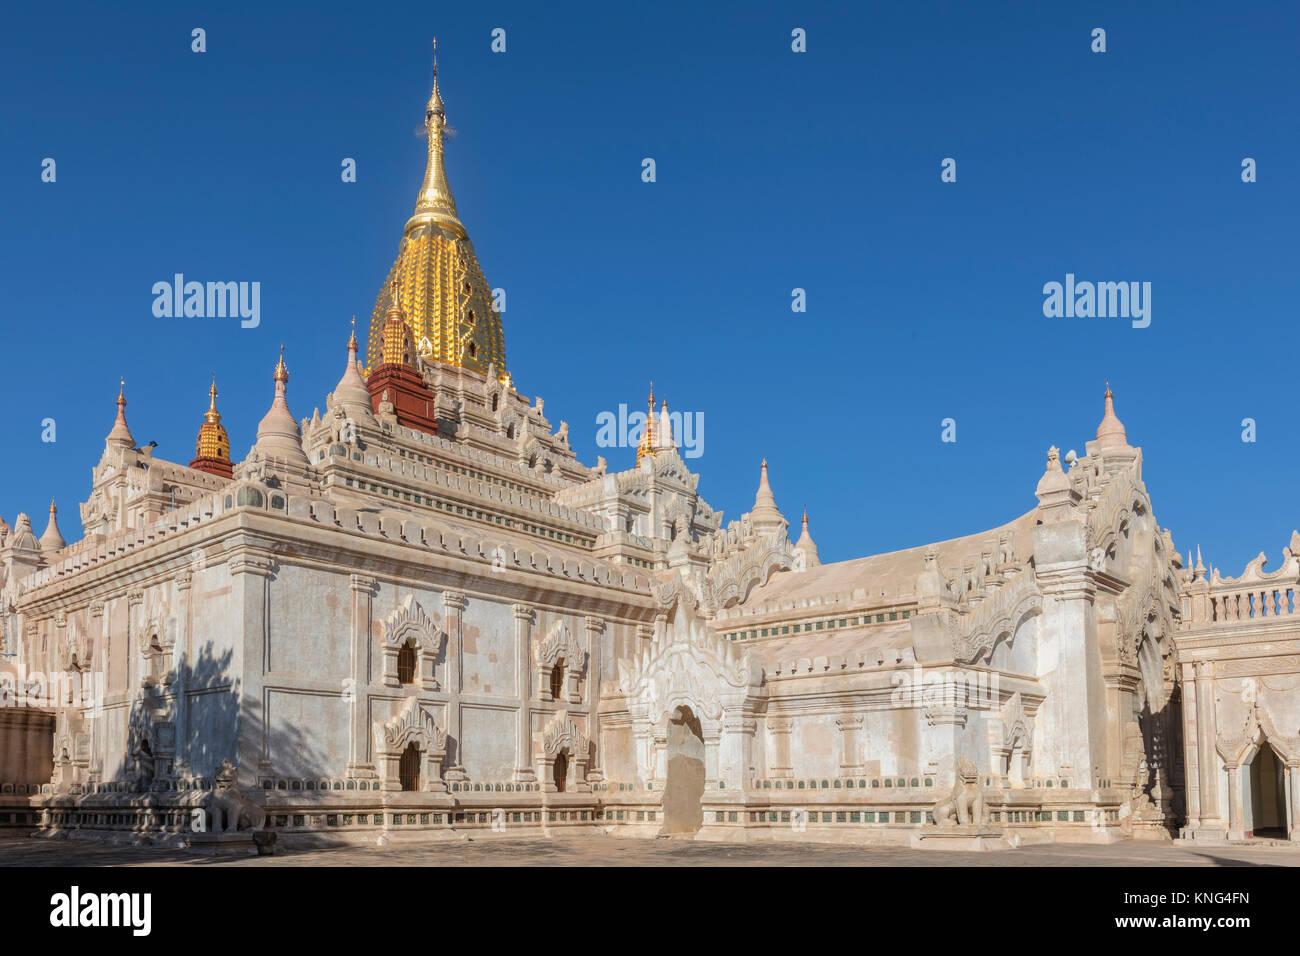 El Templo de Ananda, Bagan, Mandalay, Myanmar, Asia Imagen De Stock